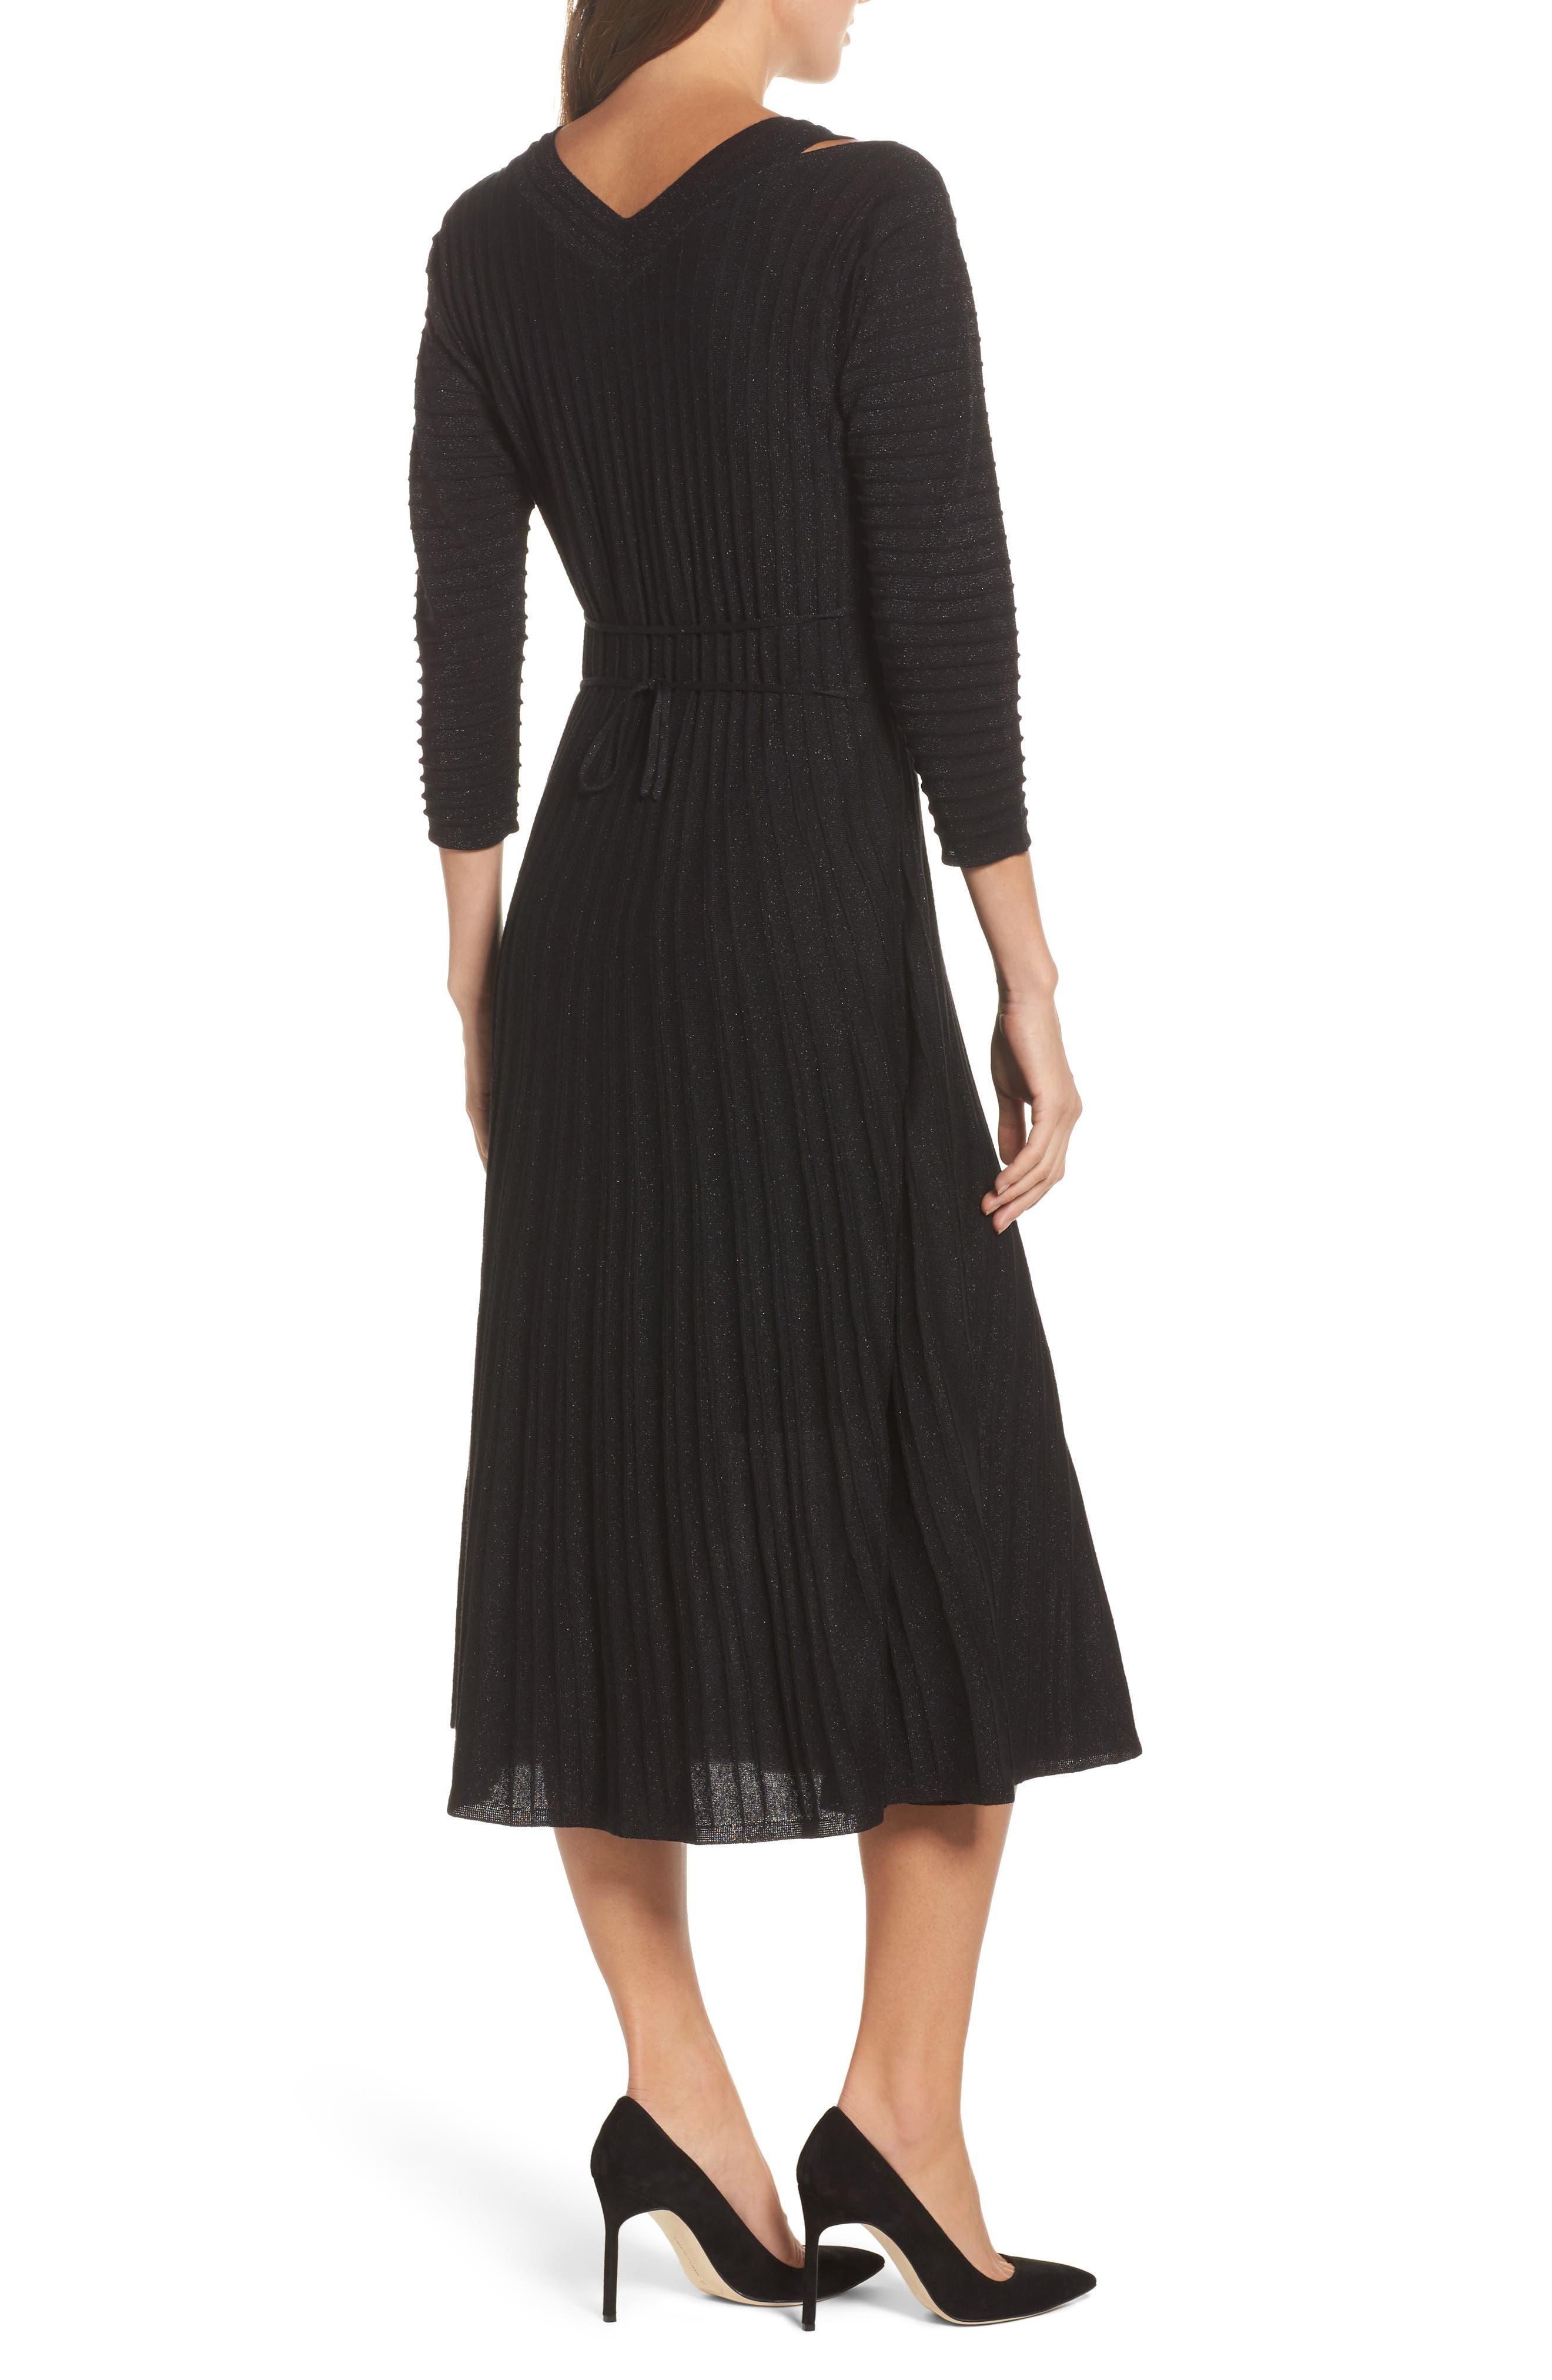 NIC + ZOE Shimmer Pleats Dress,                             Alternate thumbnail 2, color,                             Metallic B